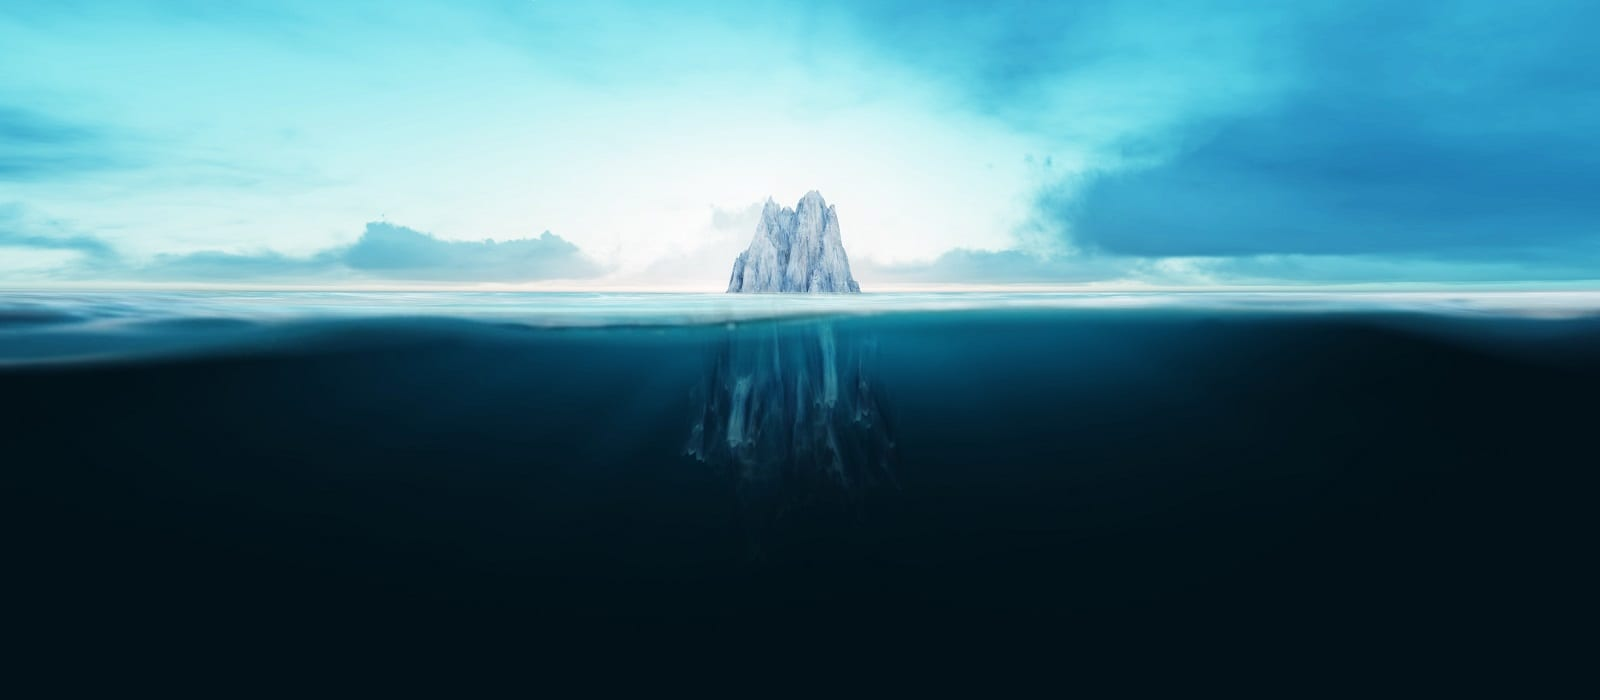 Iceberg underwater in the ocean